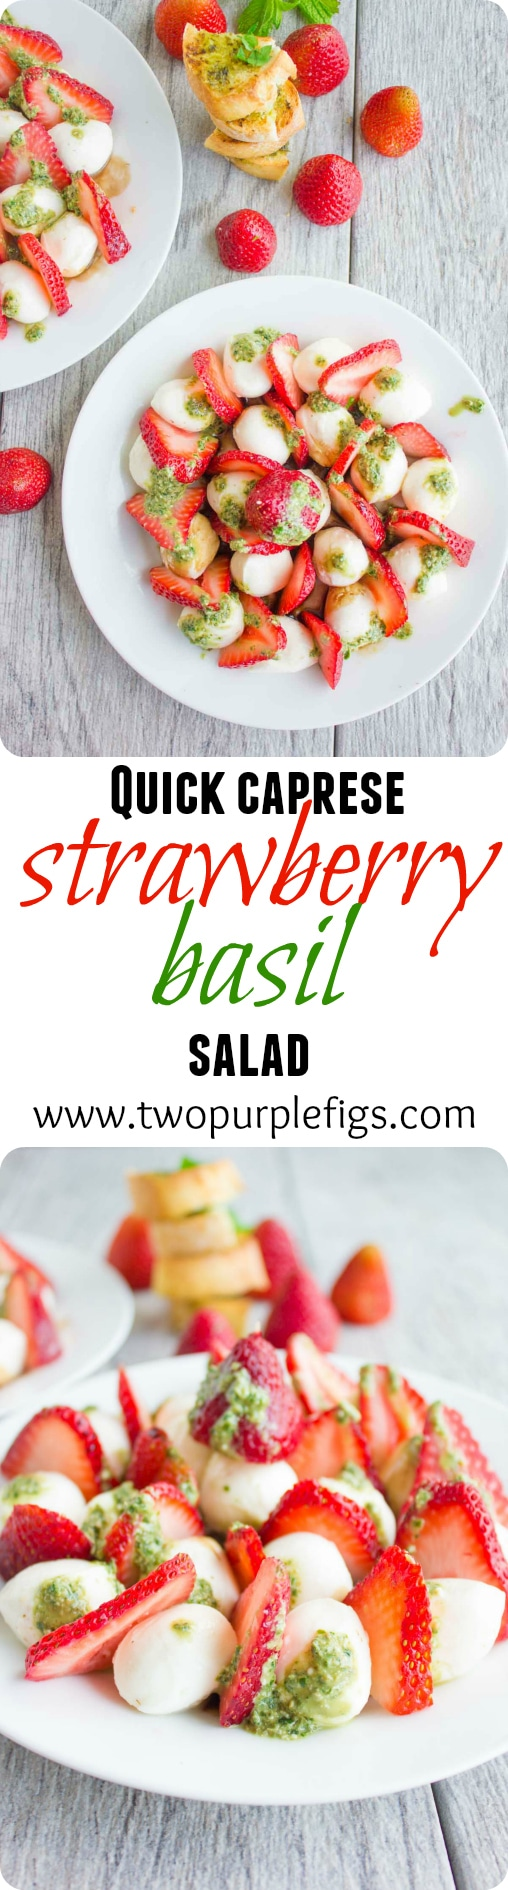 Quick Caprese Salad with Stawberries & Basil Pesto   www.twopurplefigs.com  #healthy, #italian, #pesto, #easy, #skewers, #fingerfood,